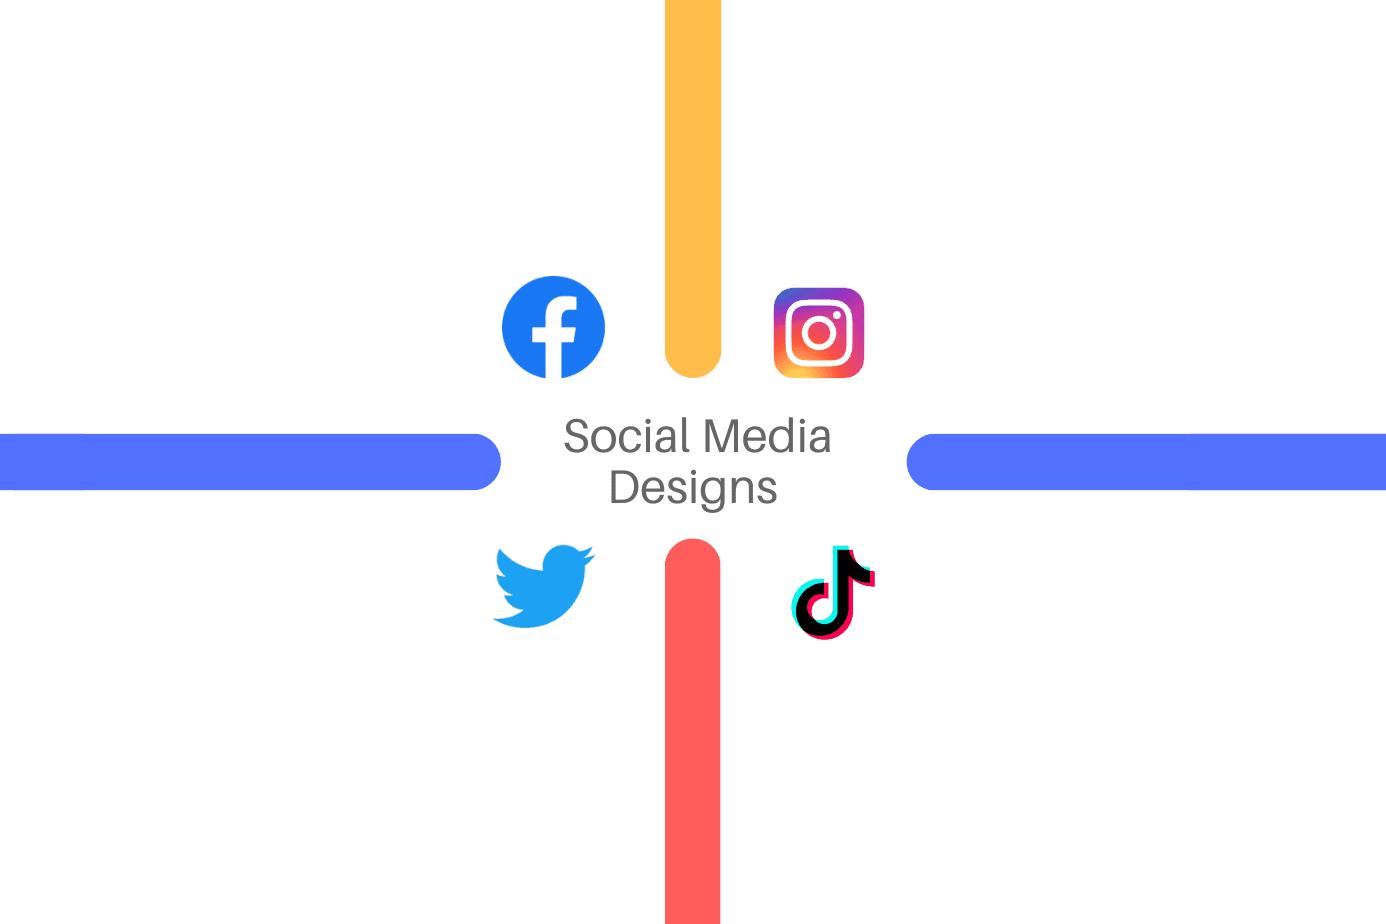 Portfolio for Designing Social Media Stories & Posts